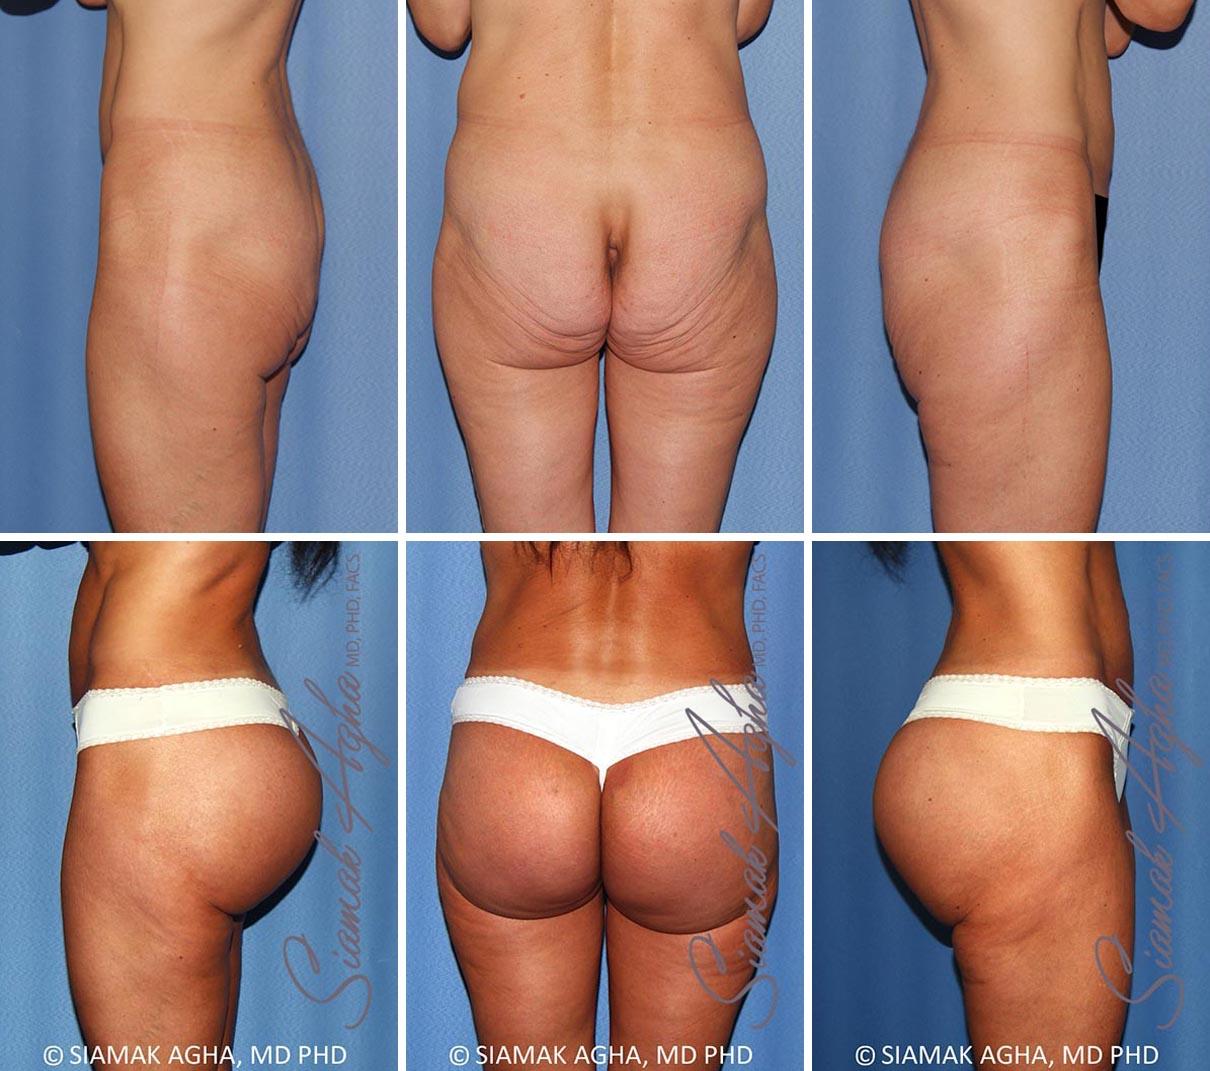 Brazilian Butt Lift Before and After Set 2